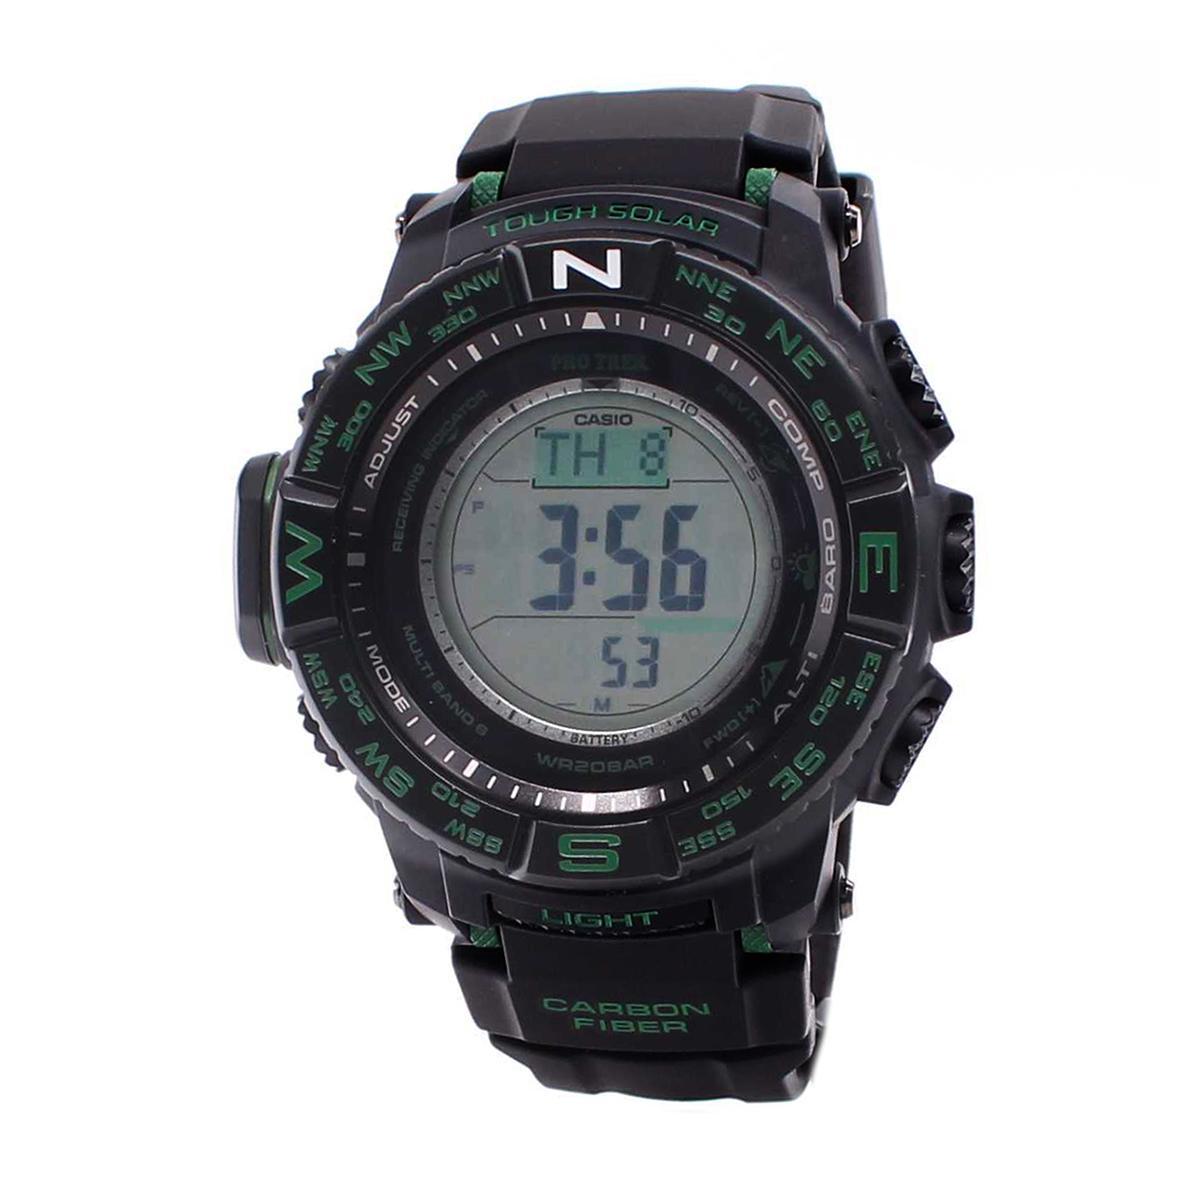 Buying Casio Watch Pro Trek Tough Solar Black Resin Case Resin Strap Mens Prw S3500 1D